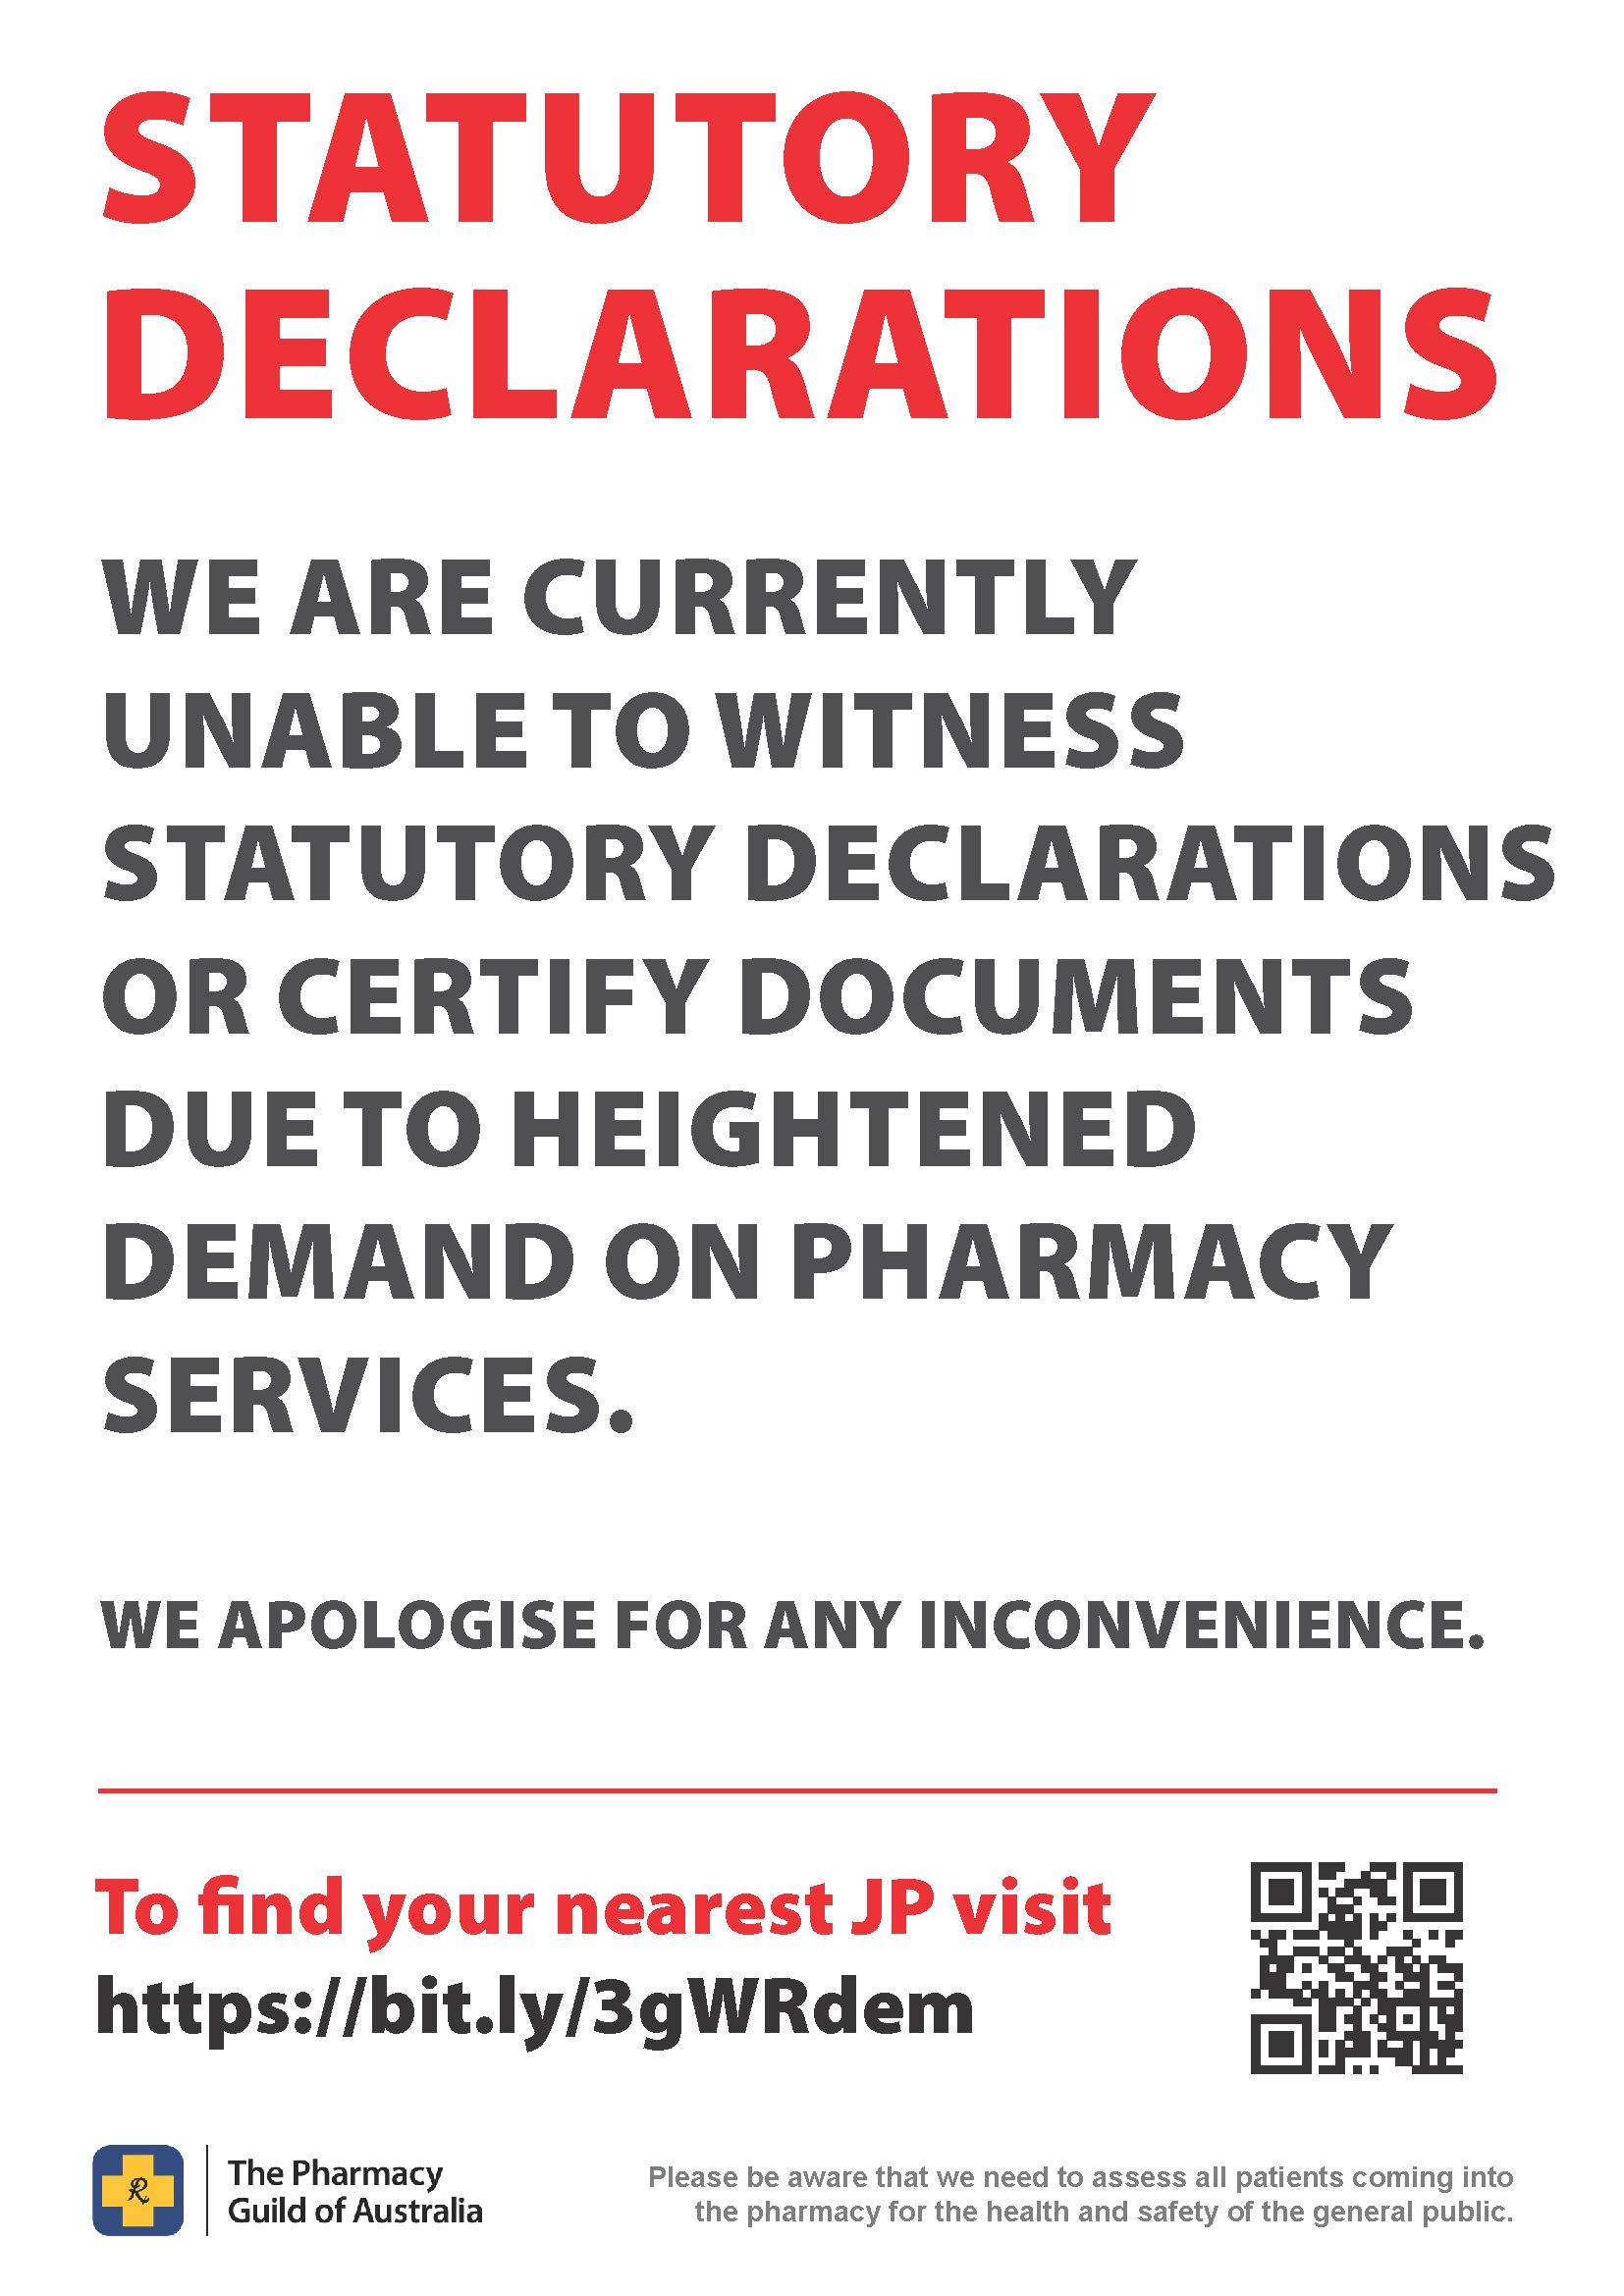 Statutory Declarations - A4 Size